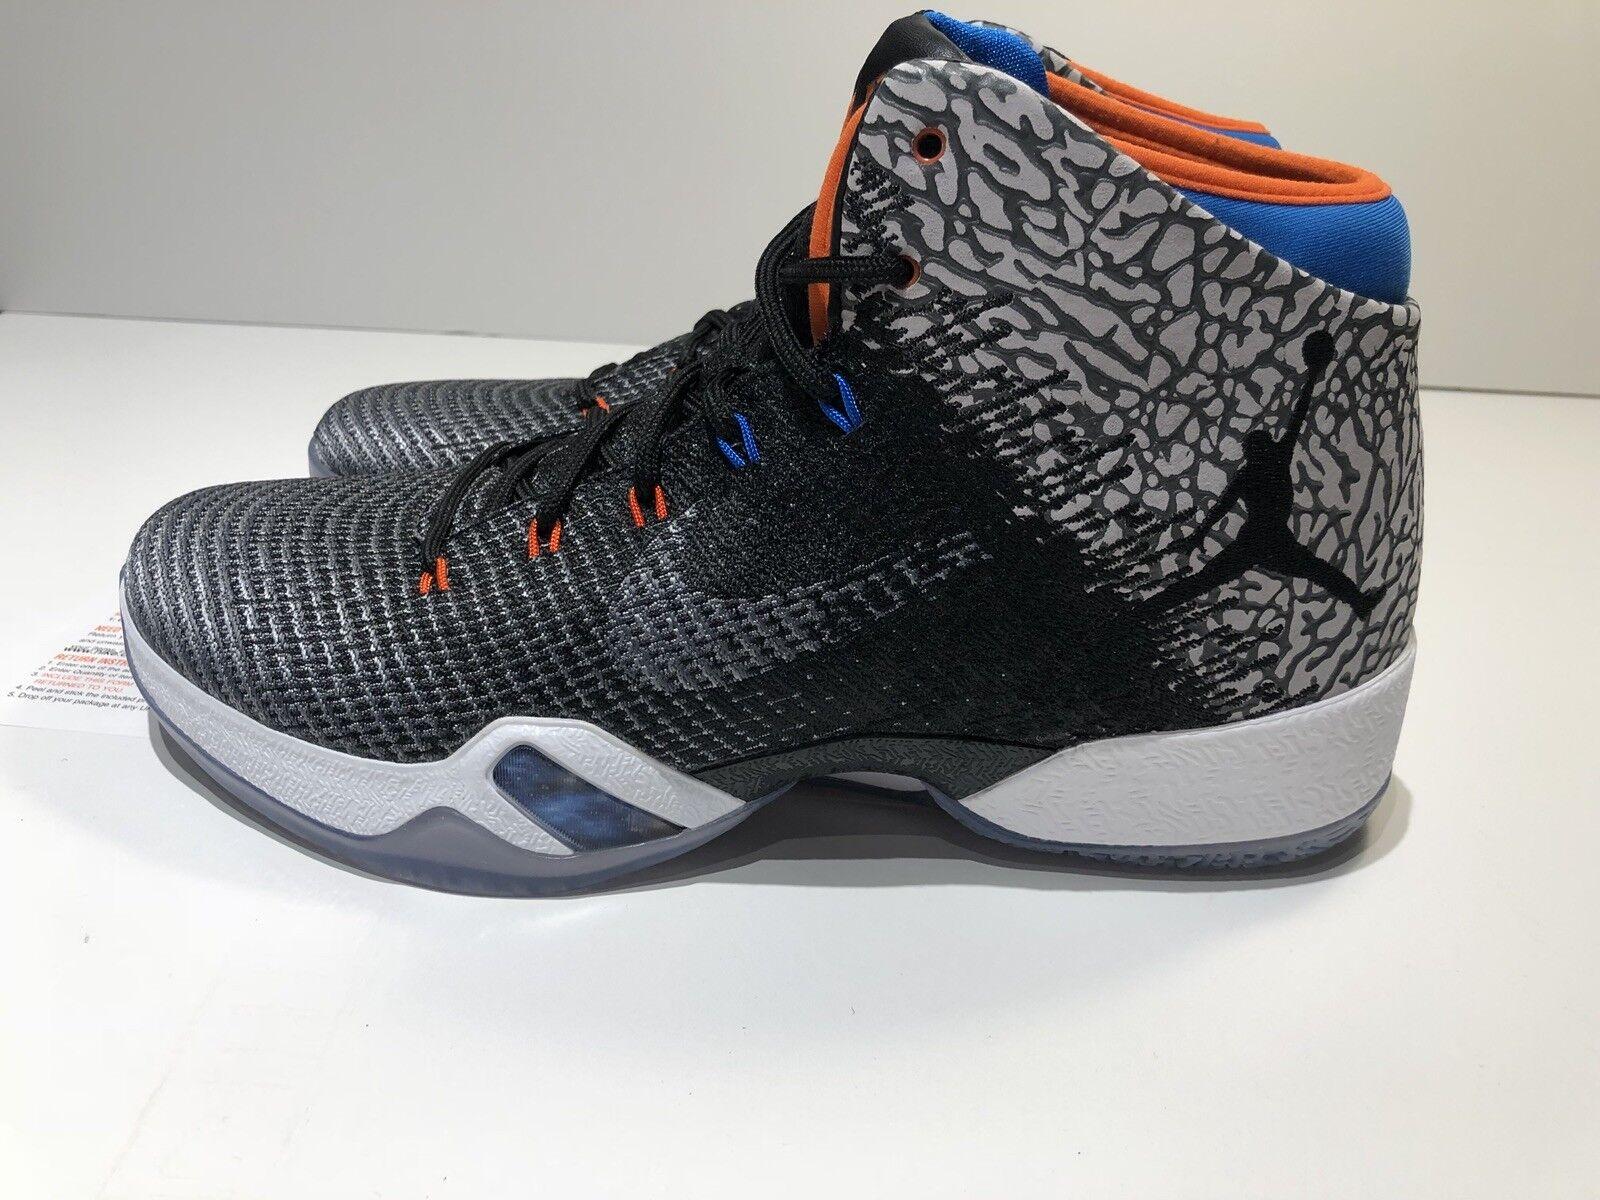 Nike air jordan 31 'russell westbrook - mvp thunder dimensioni